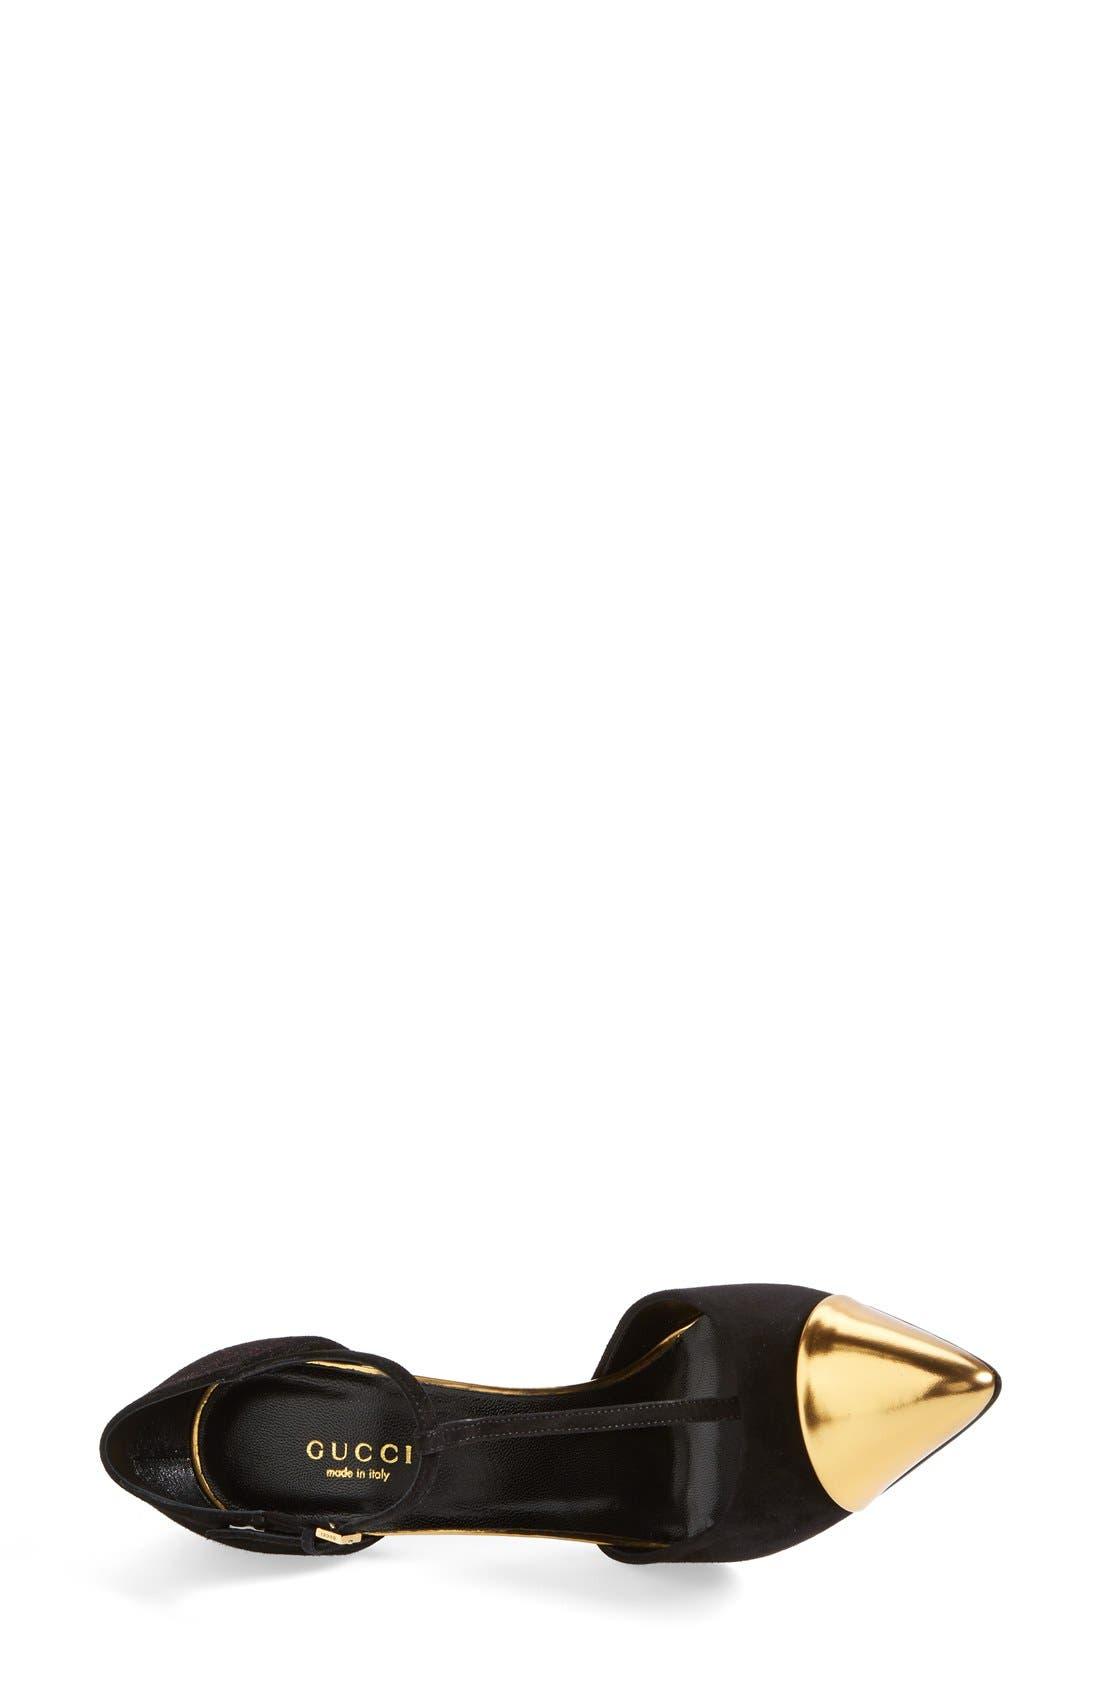 Alternate Image 3  - Gucci 'Coline' T-Strap Cap Toe Pump (Women)